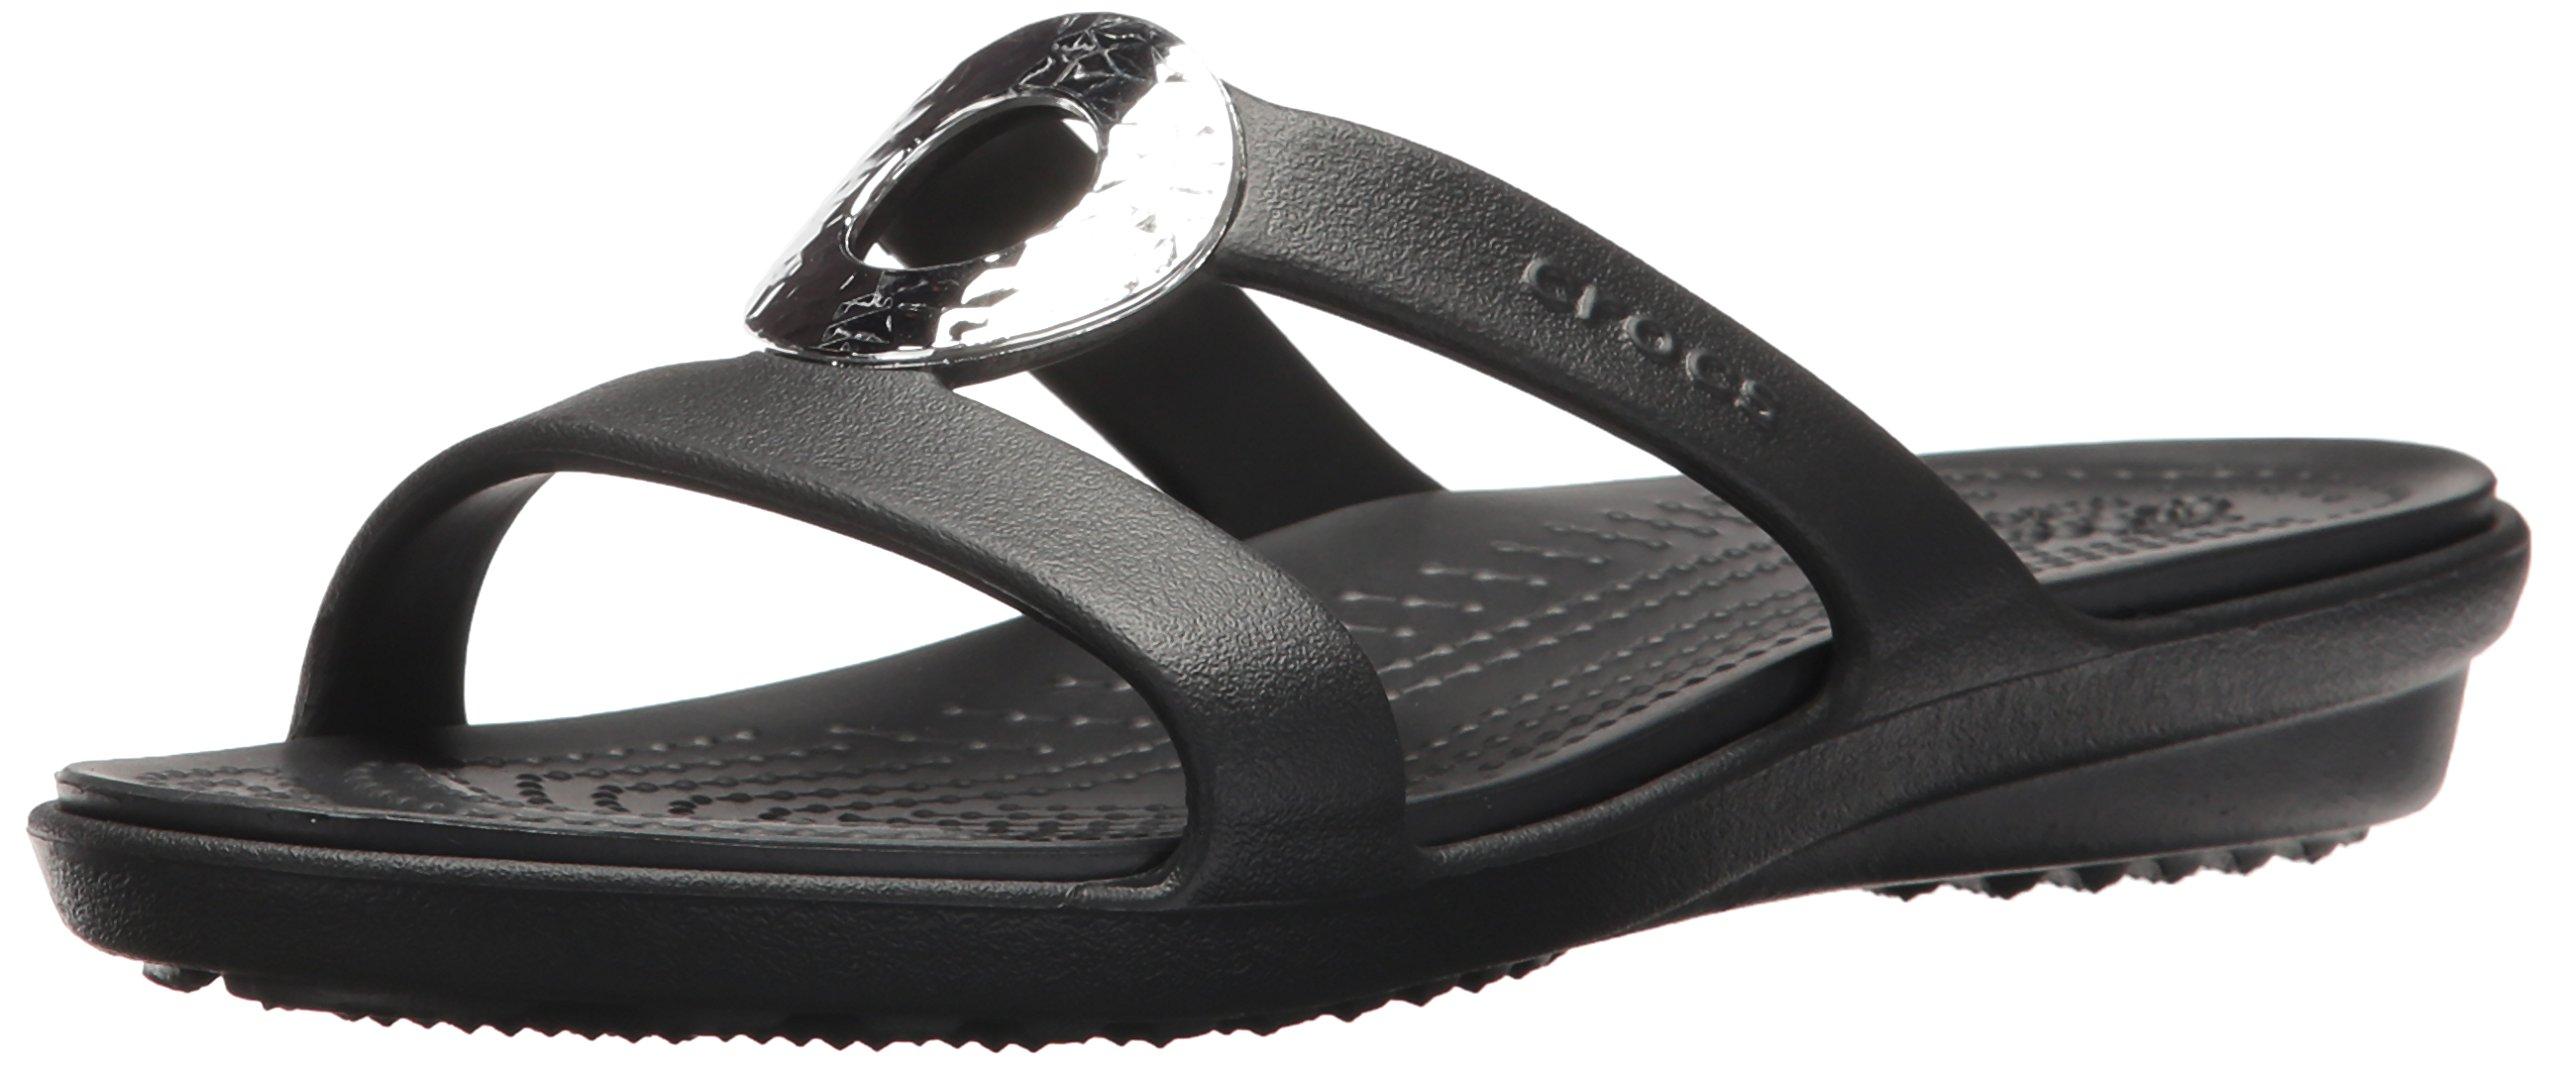 b2d38d86b0c8 Crocs Women s Sanrah Hammered Met Sandal W Flat Black